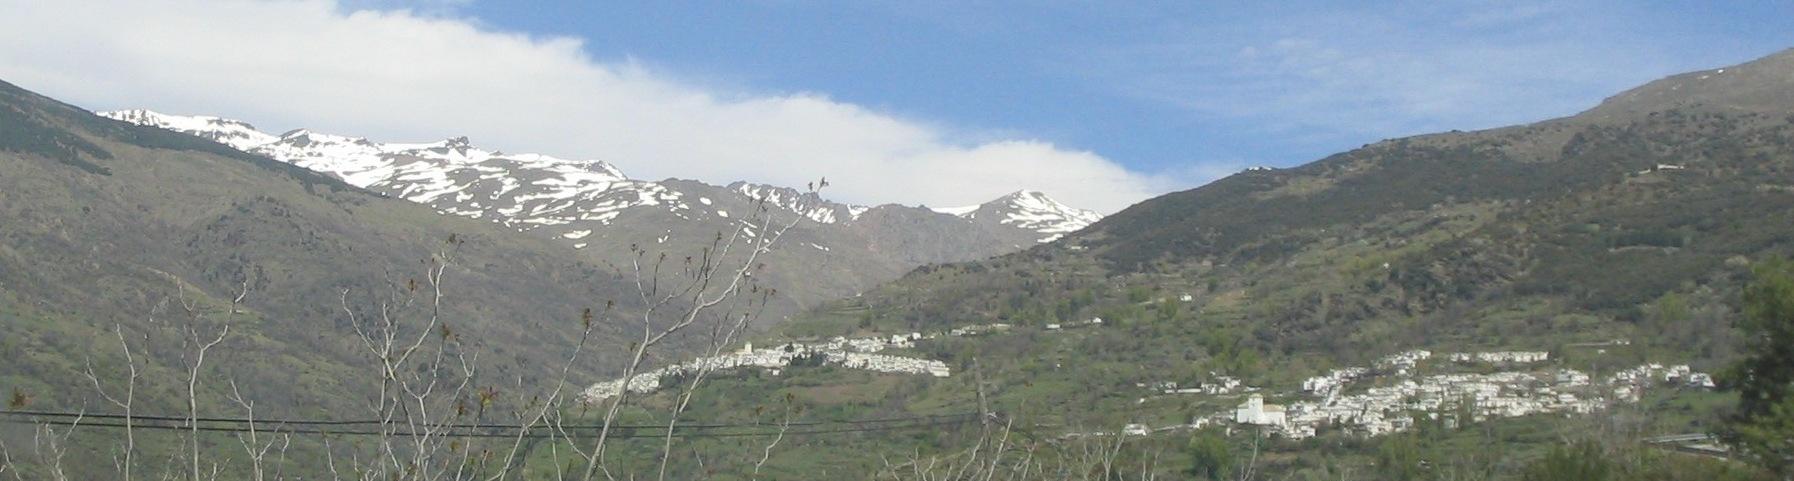 http://upload.wikimedia.org/wikipedia/commons/8/86/Alpujarras-pueblos.JPG